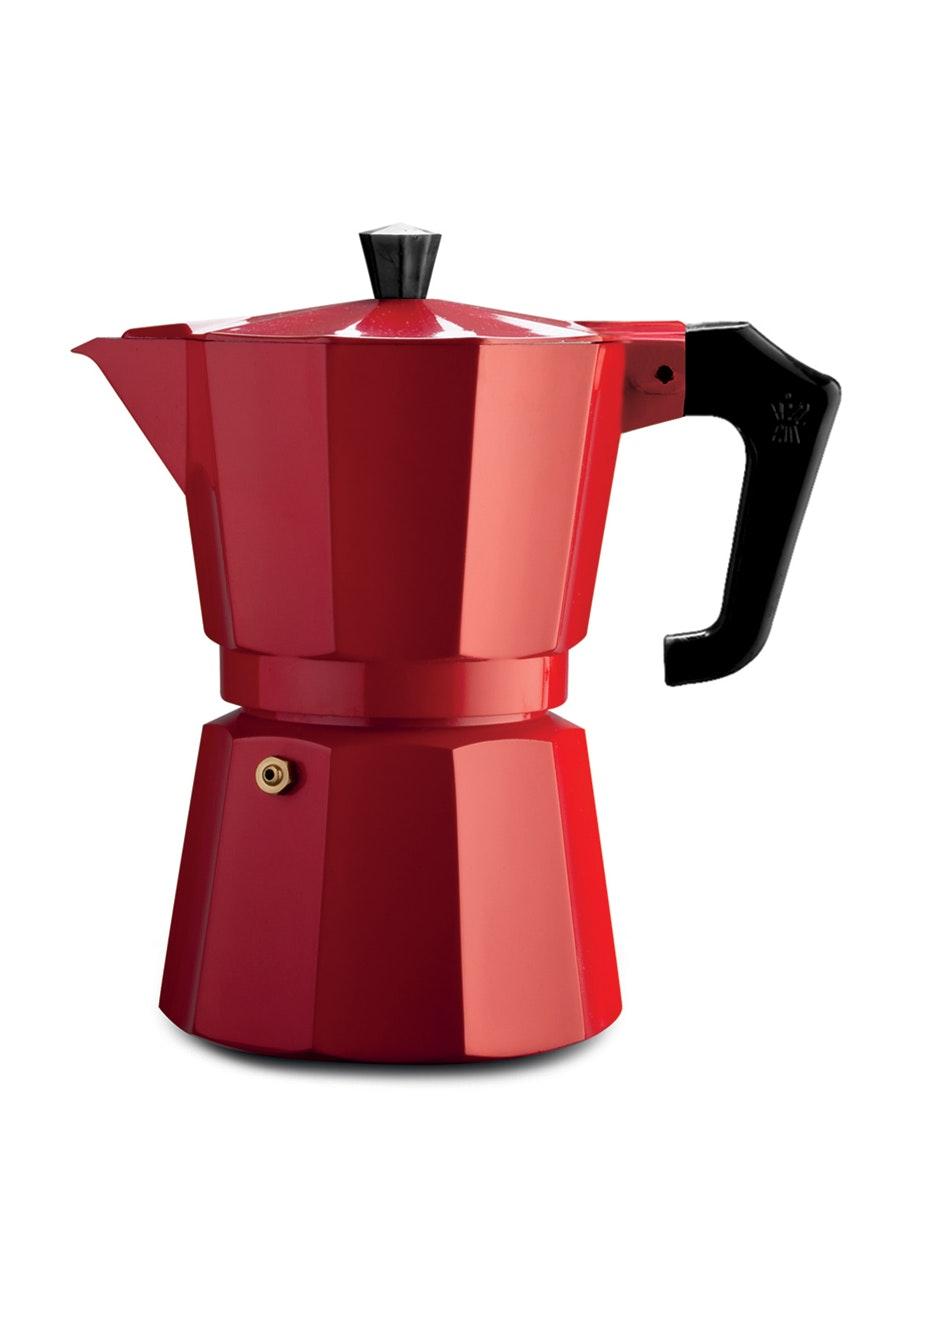 Pezzetti Red Italexpress Aluminium Coffee Maker 3Cup